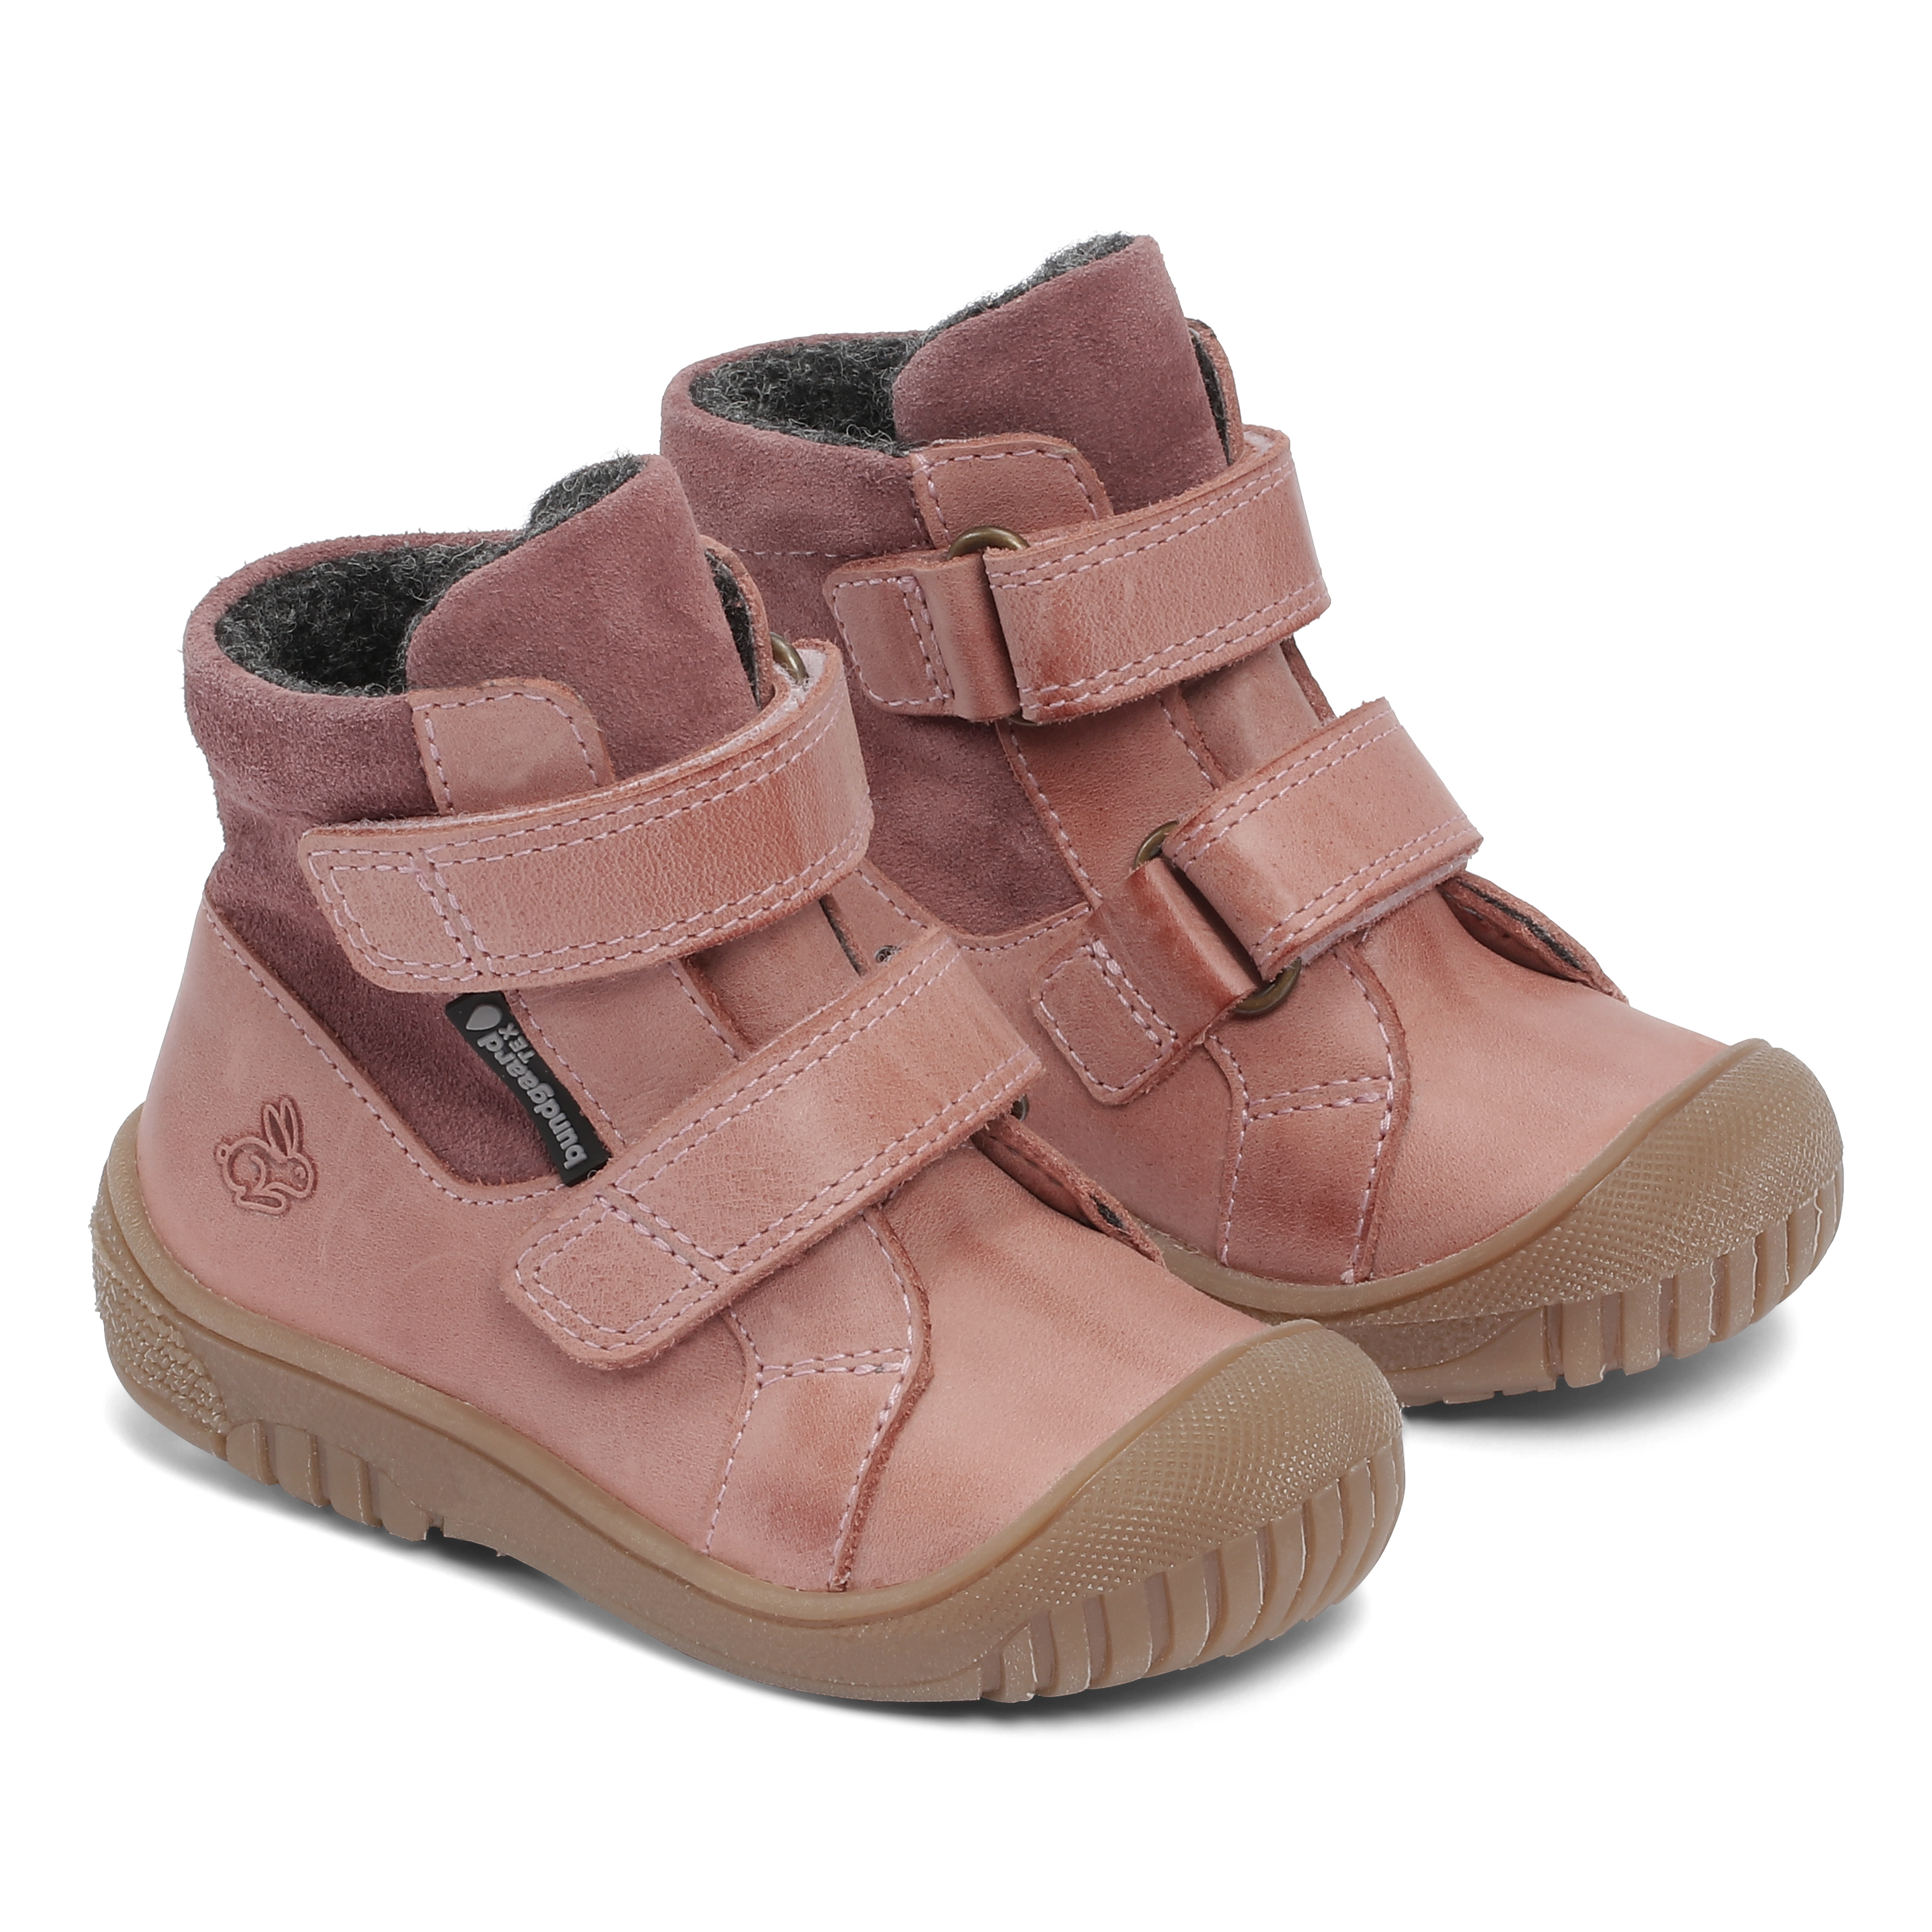 Bundgaard Siggi støvler, rose, 27